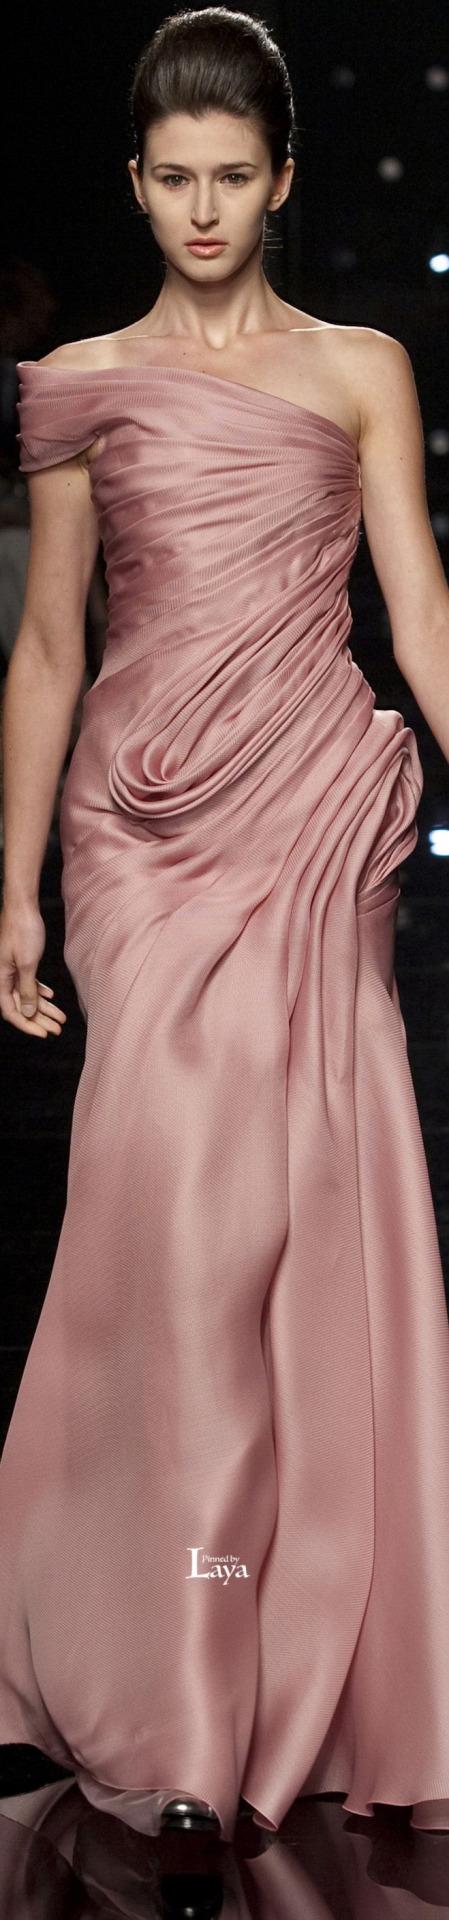 Essence of a woman | Dresses ♥ | Pinterest